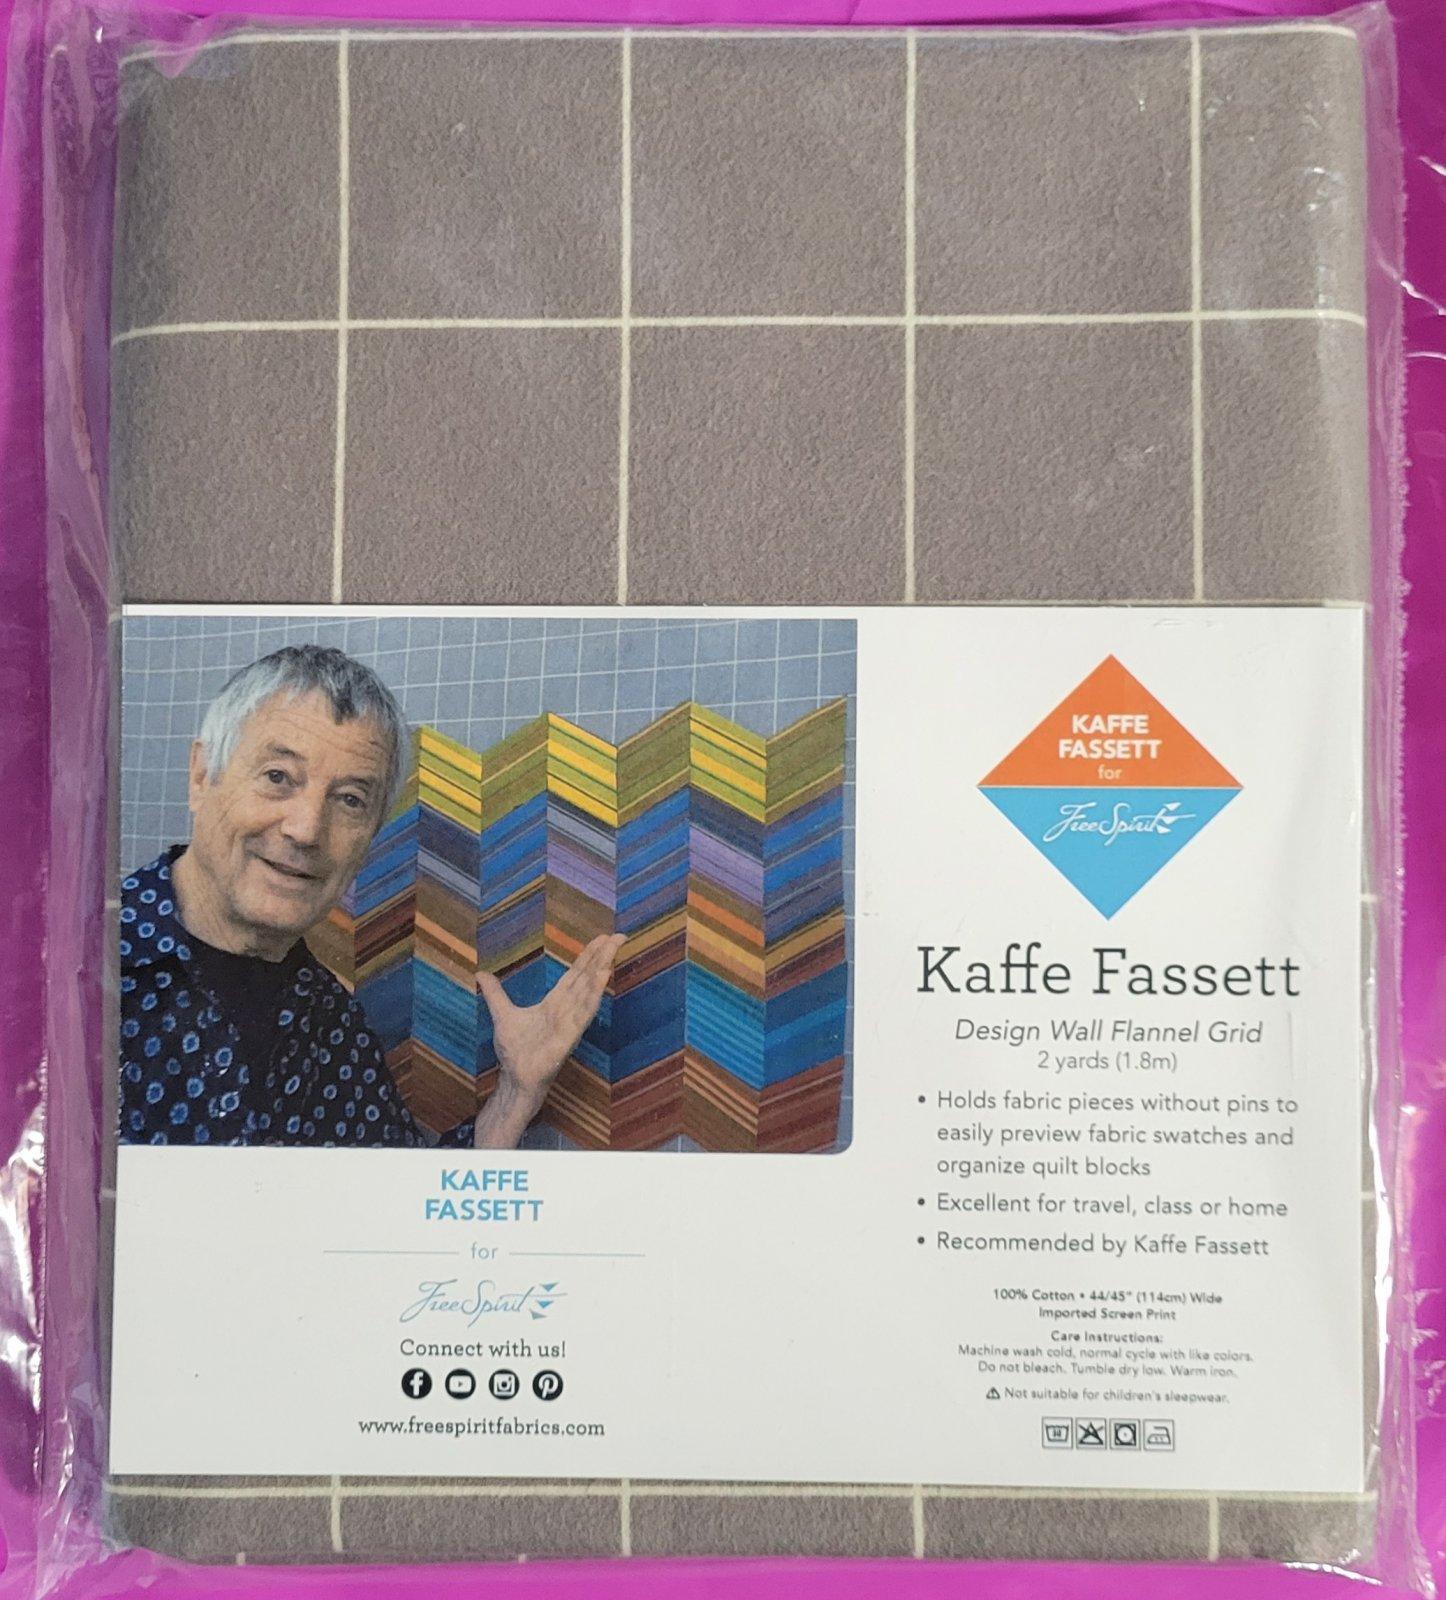 Kaffe Fassett Flannel Wall Grid